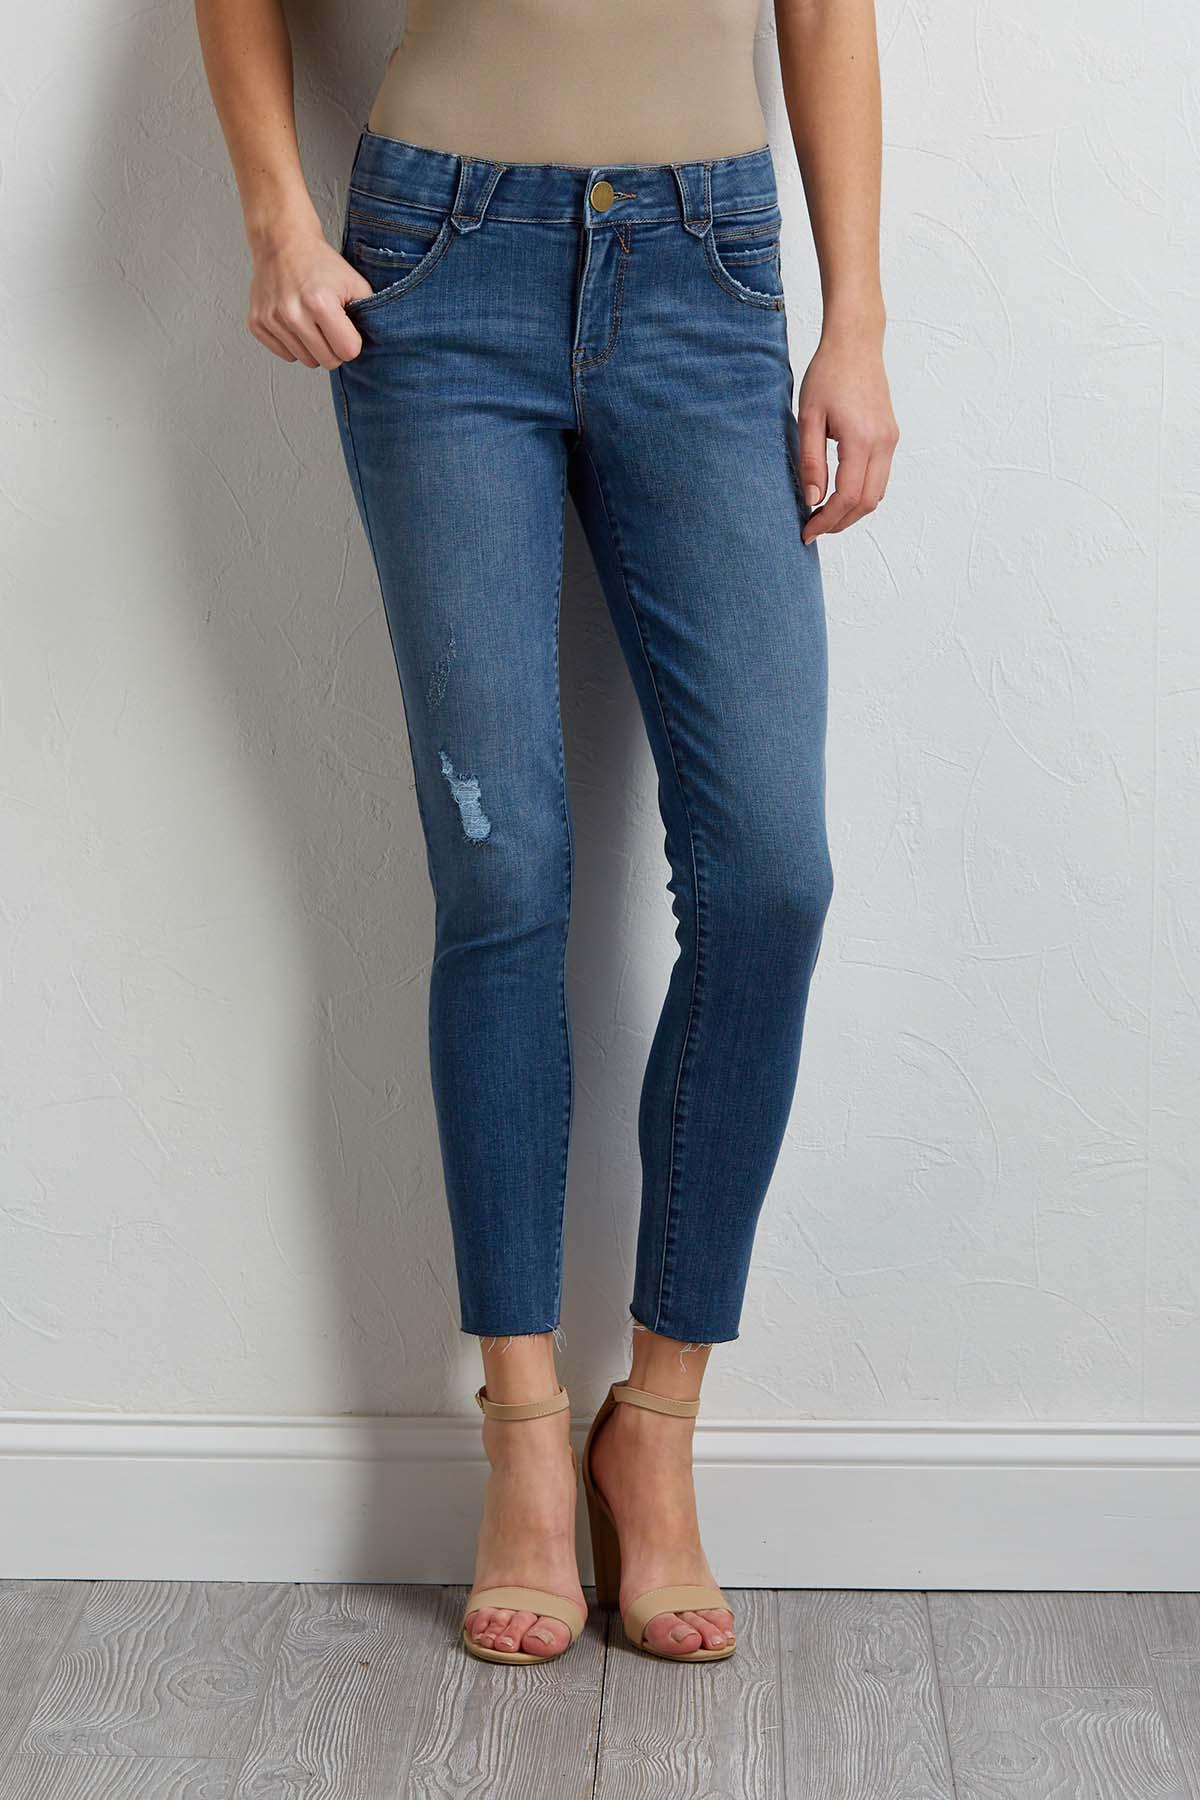 Distressed Raw Hem Ankle Jeans